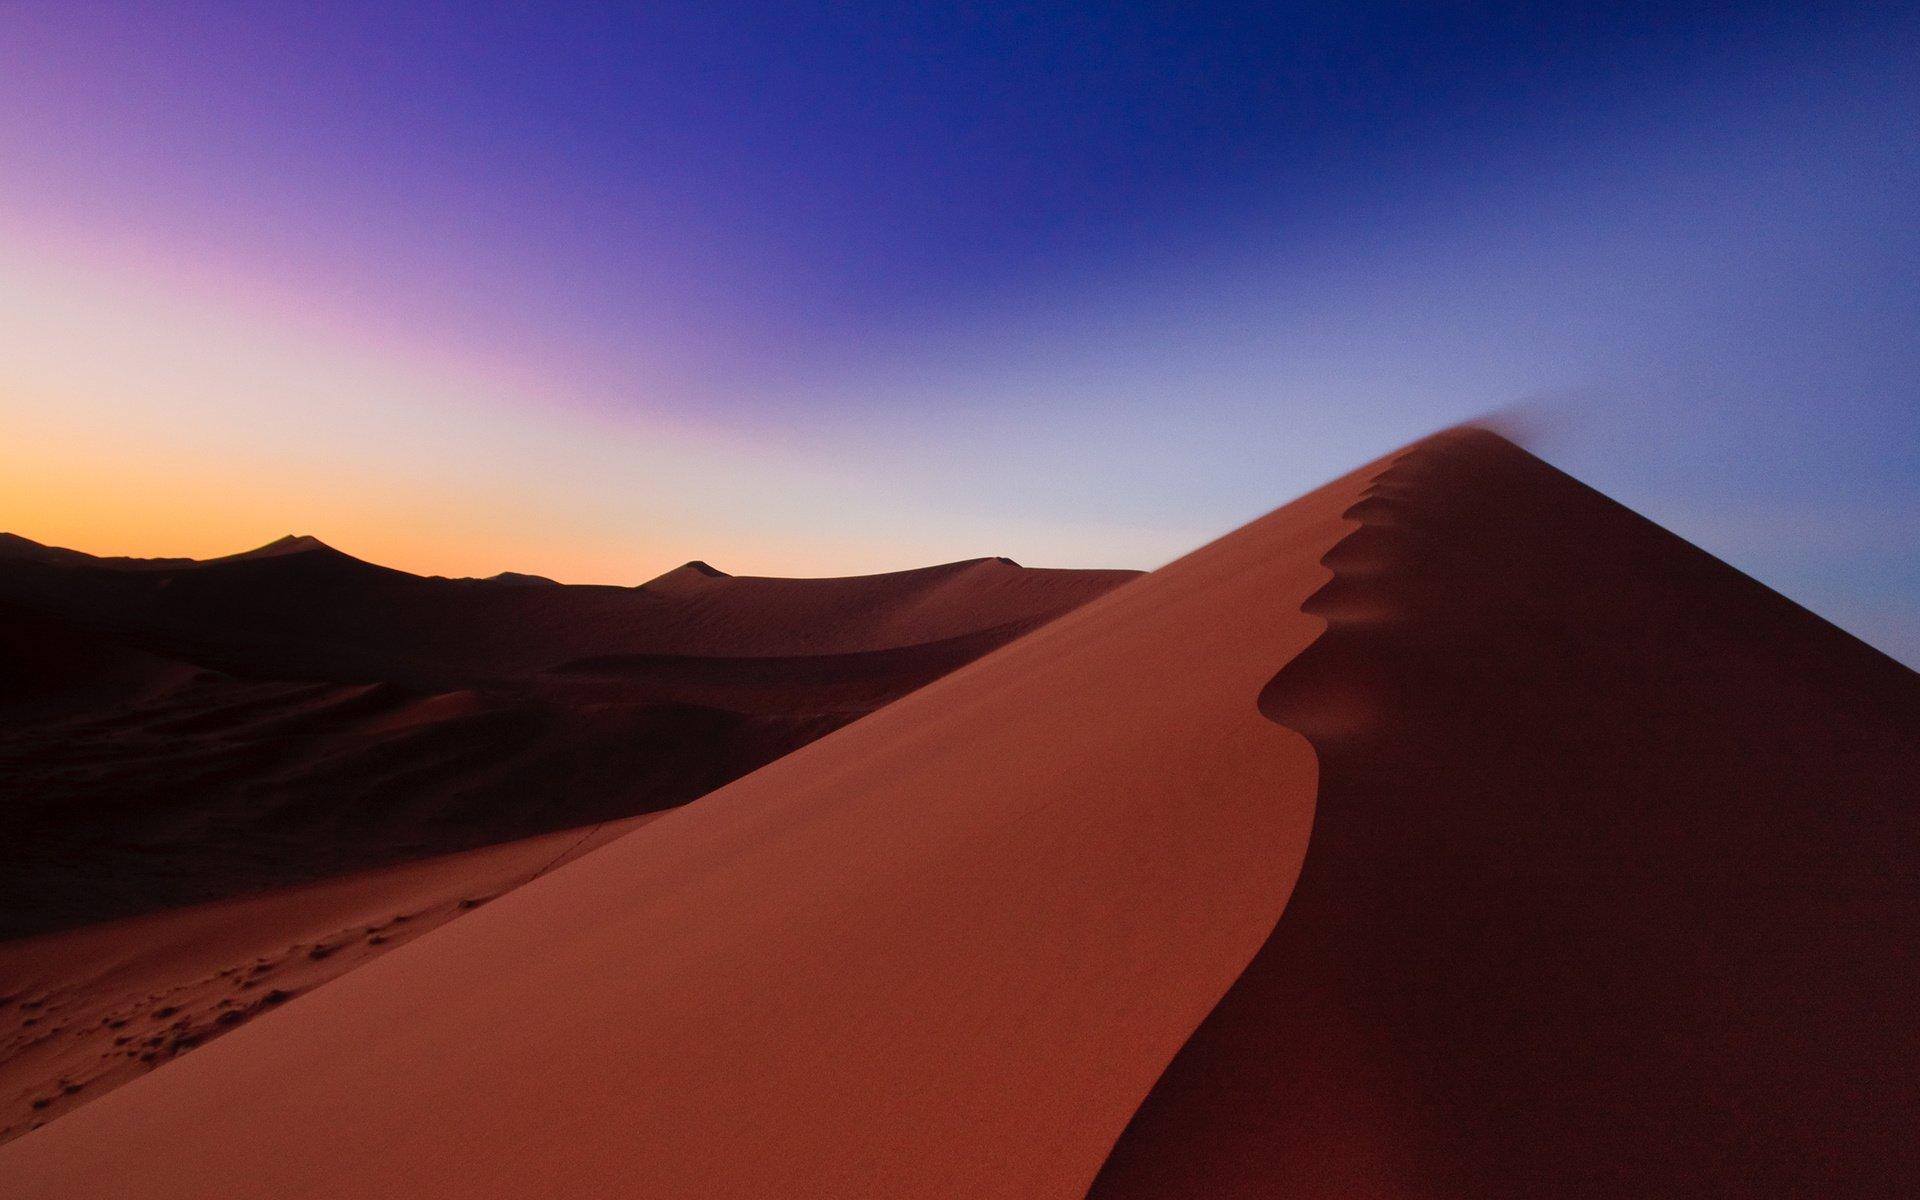 барханы пустыня дюны  № 1291851 бесплатно